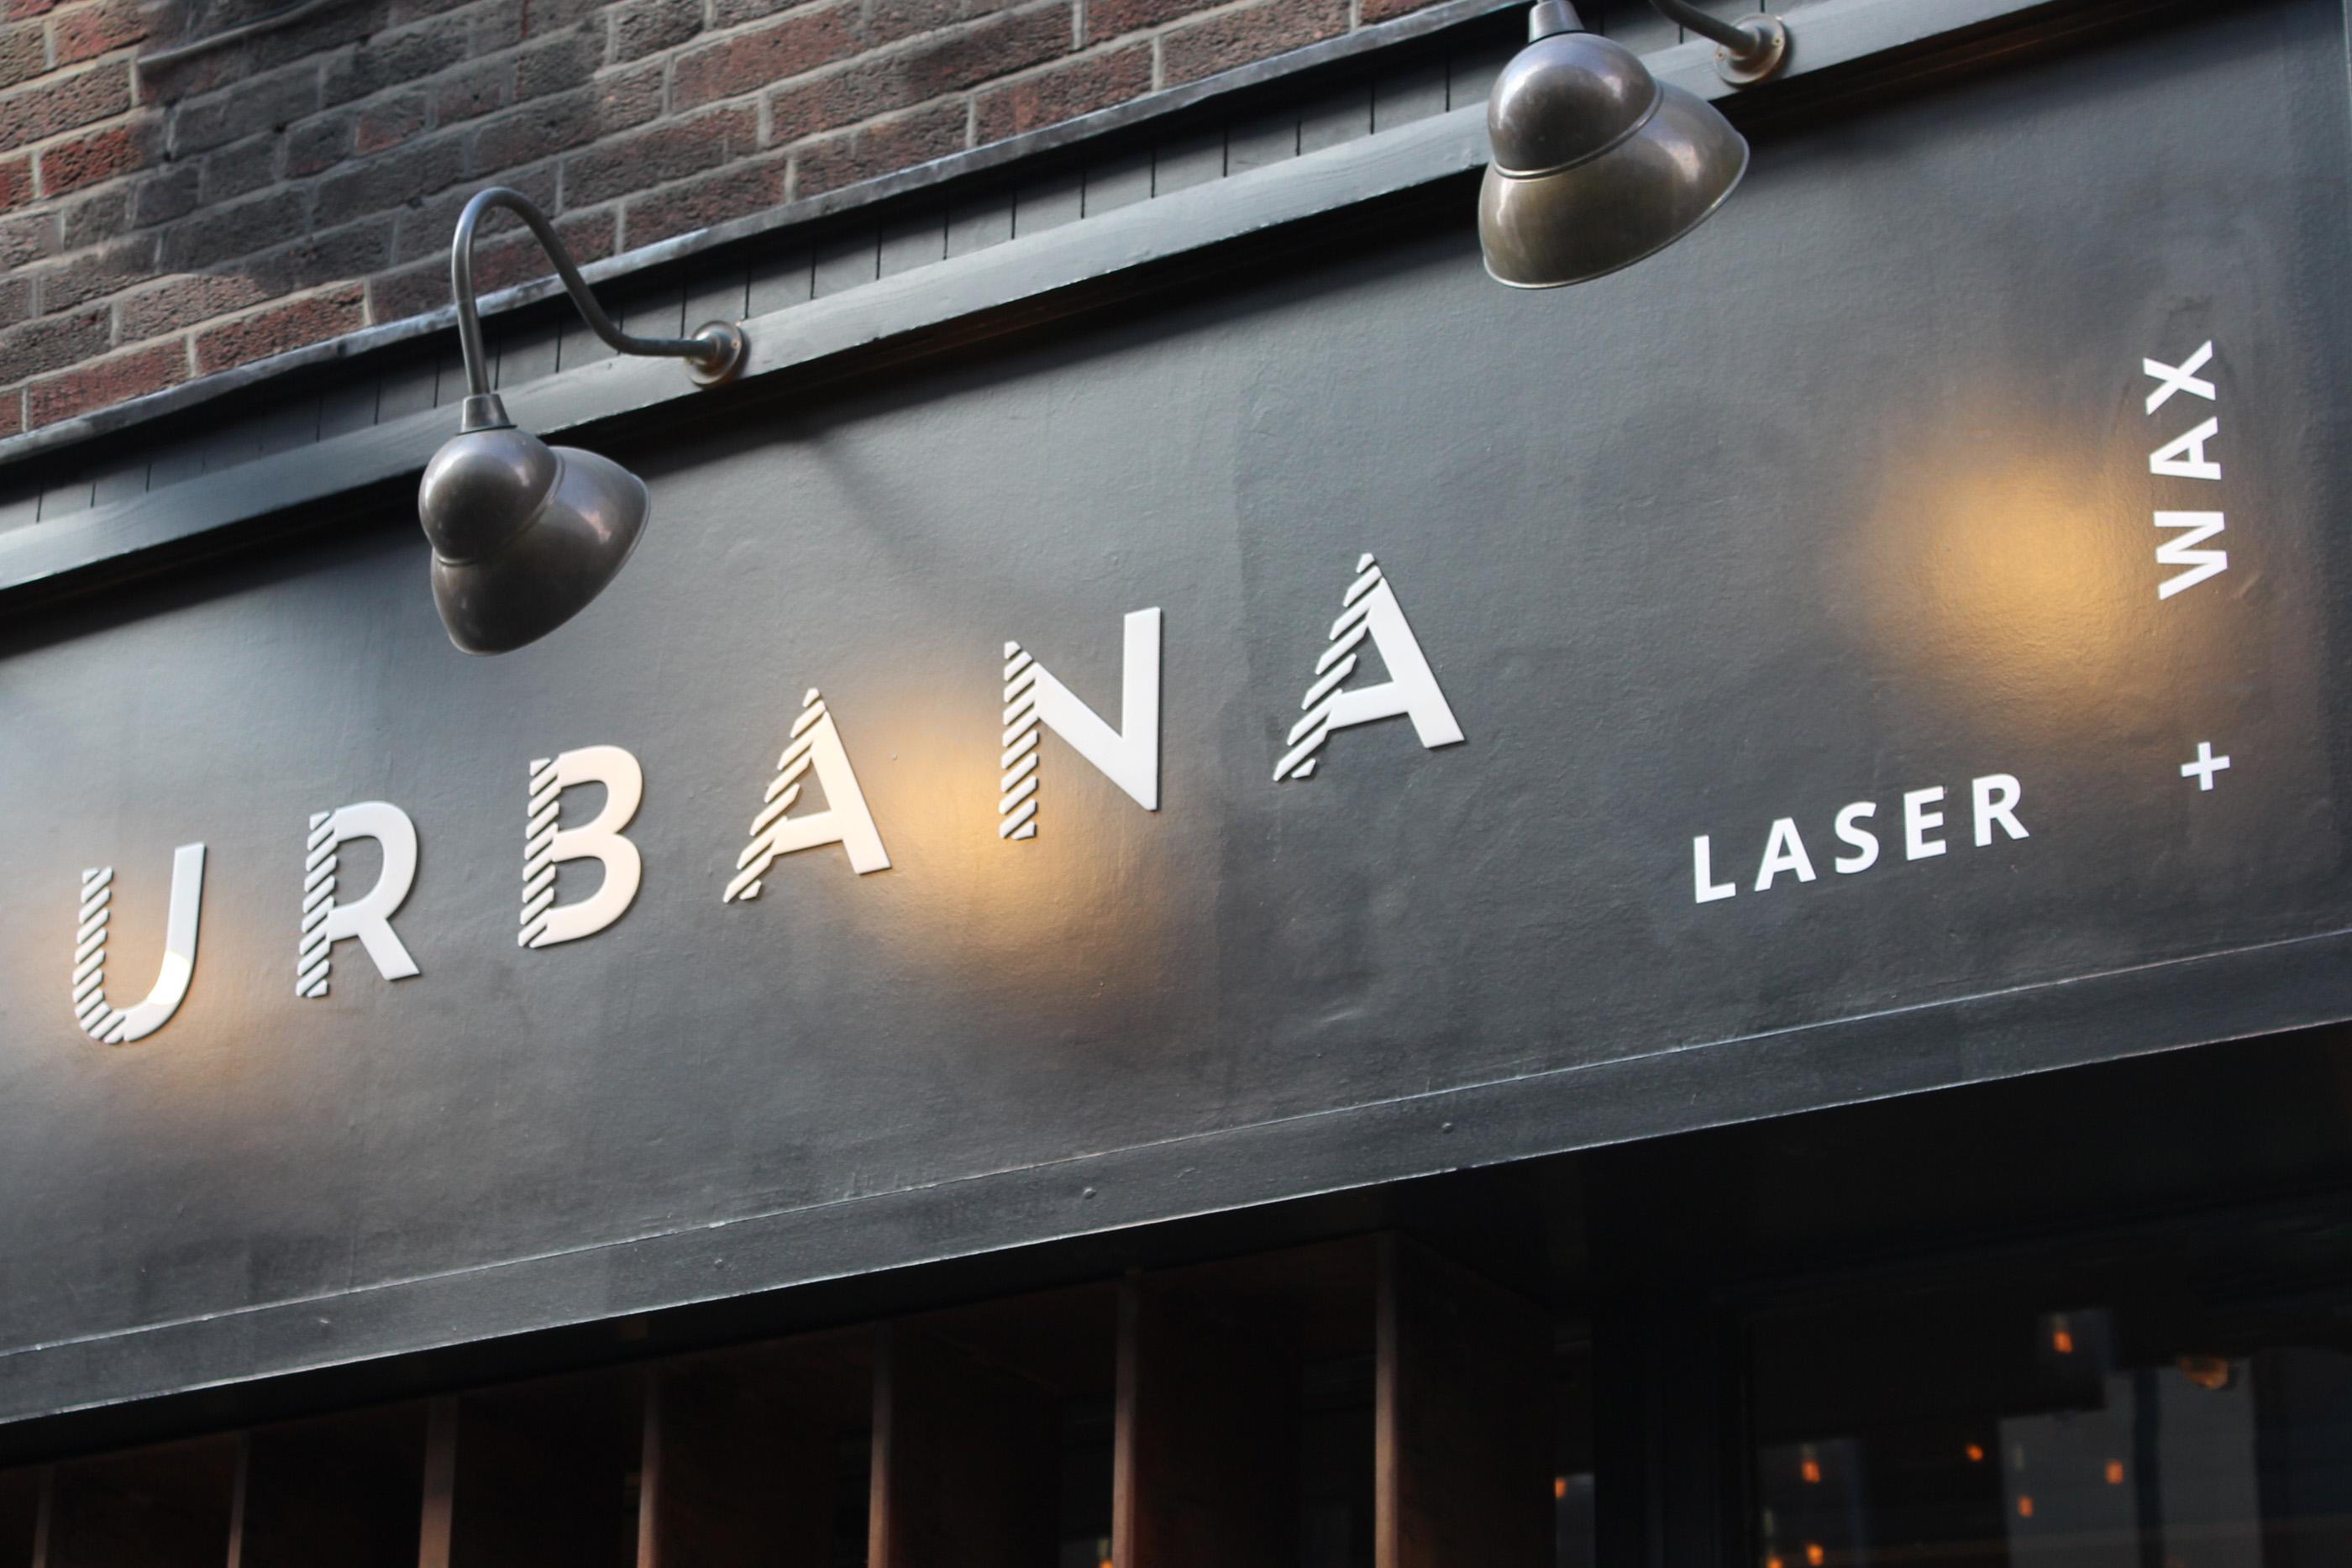 Cover image: Urbana